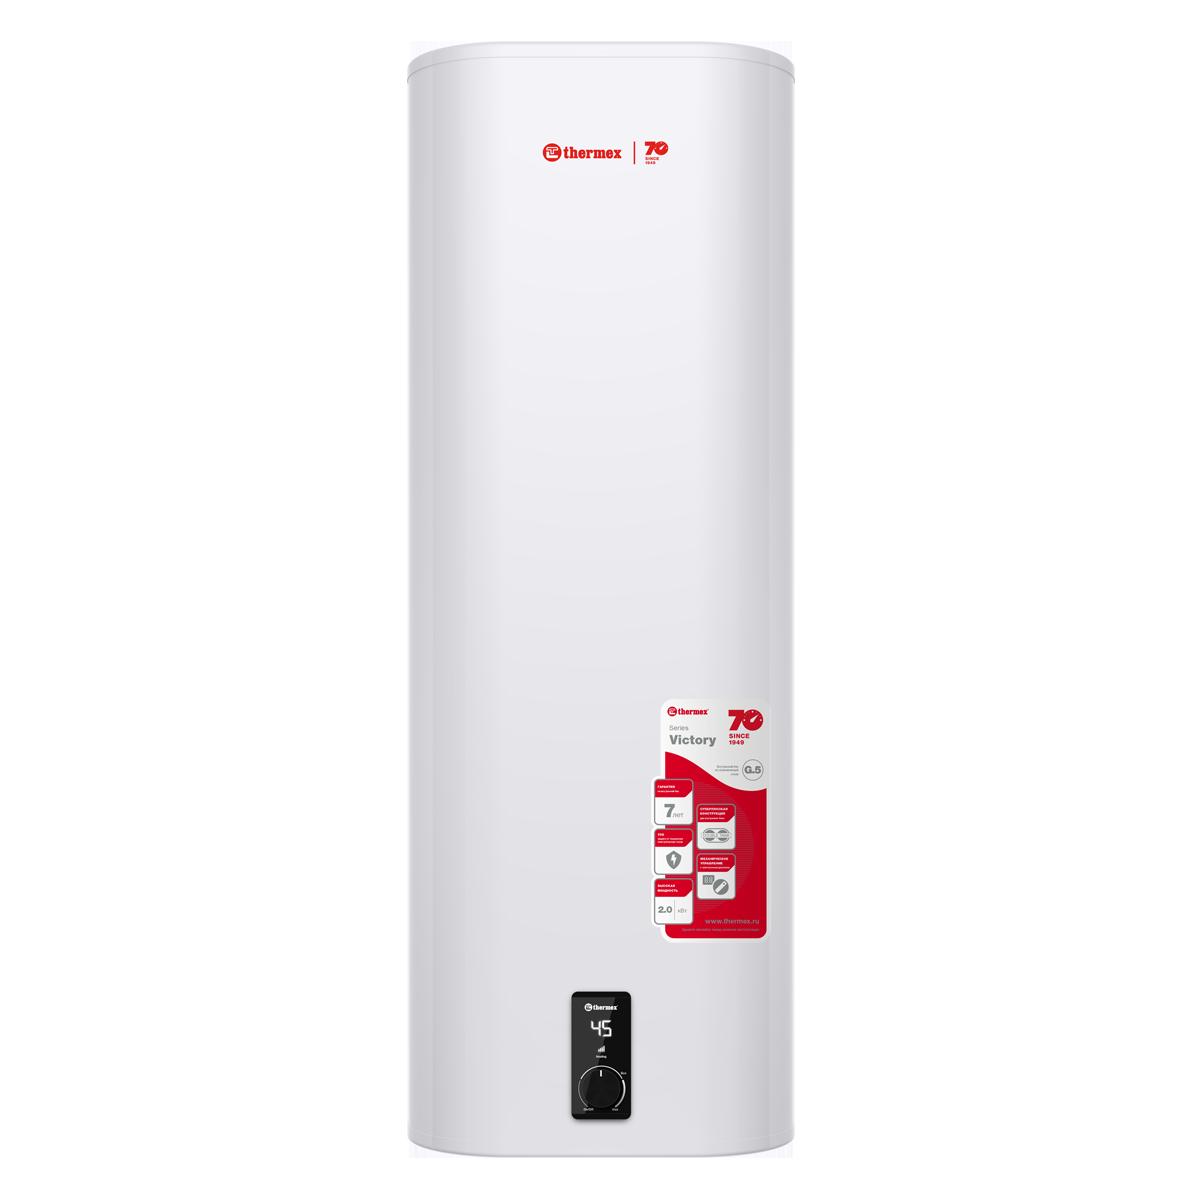 Электрический водонагреватель THERMEX Victory 100 V